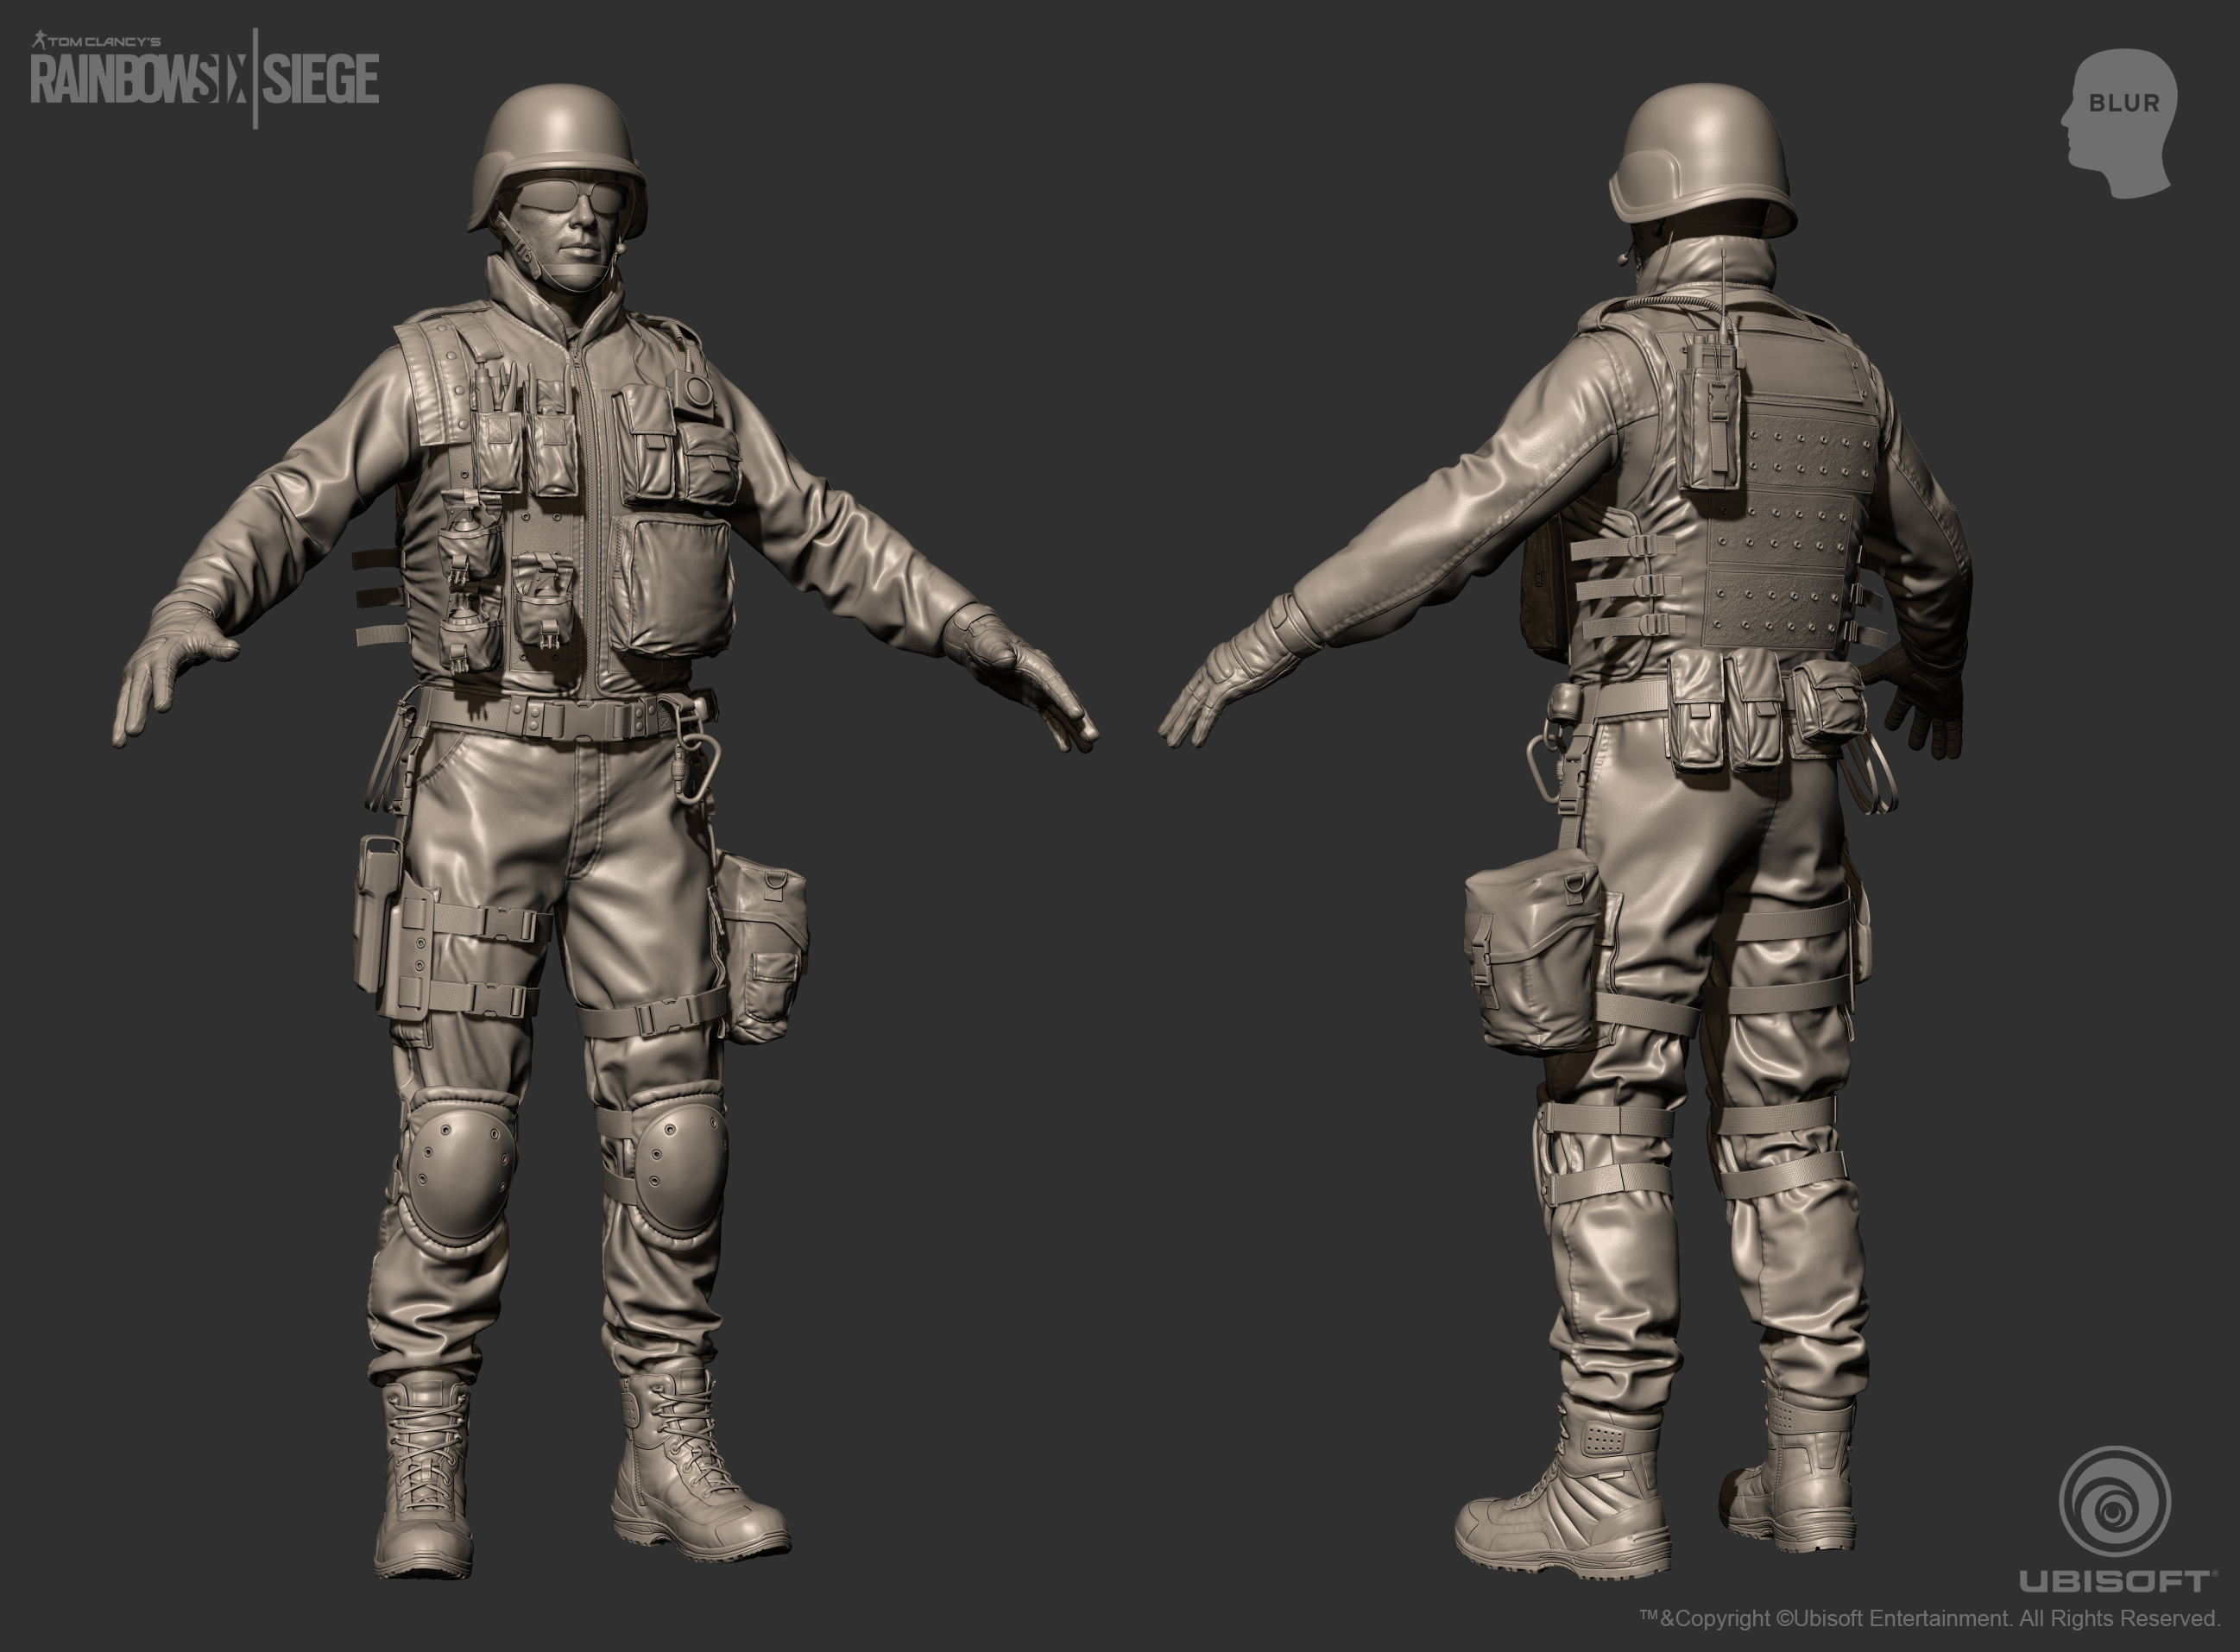 rainbow six siege cinematic swat character